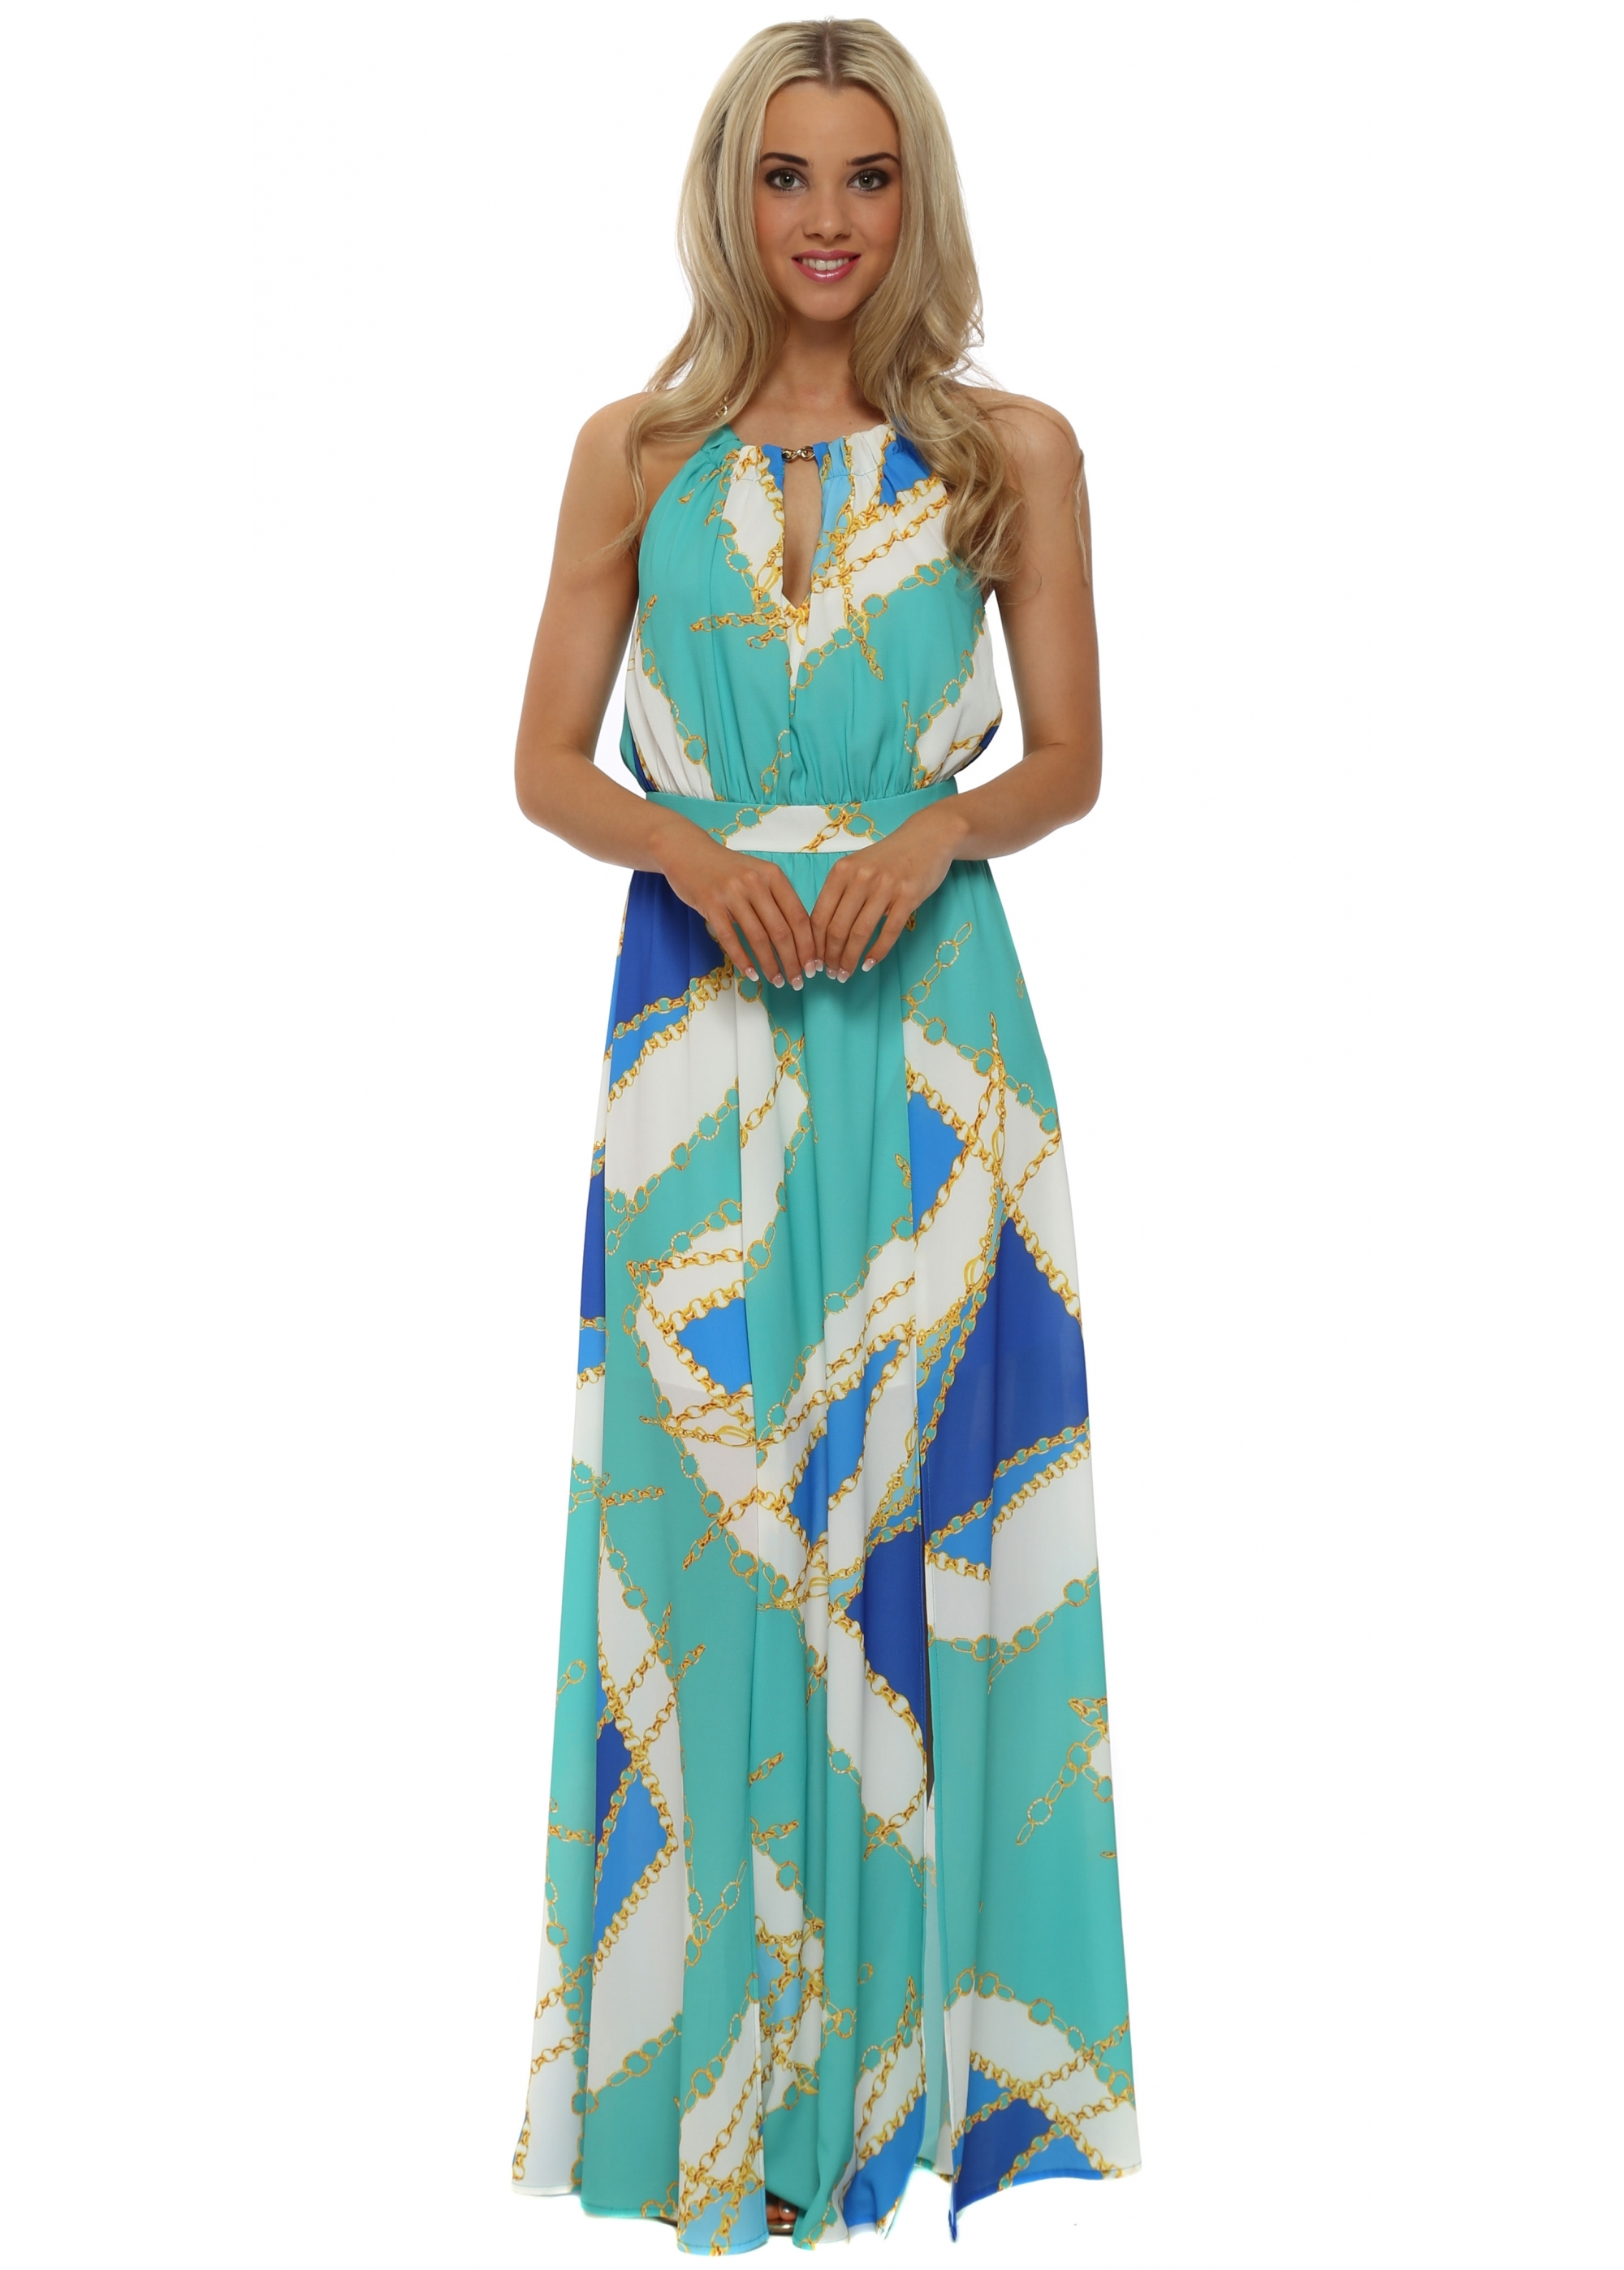 Maxi Jurk Turquoise.Rinascimento Gold Chain Print Turquoise Maxi Dress